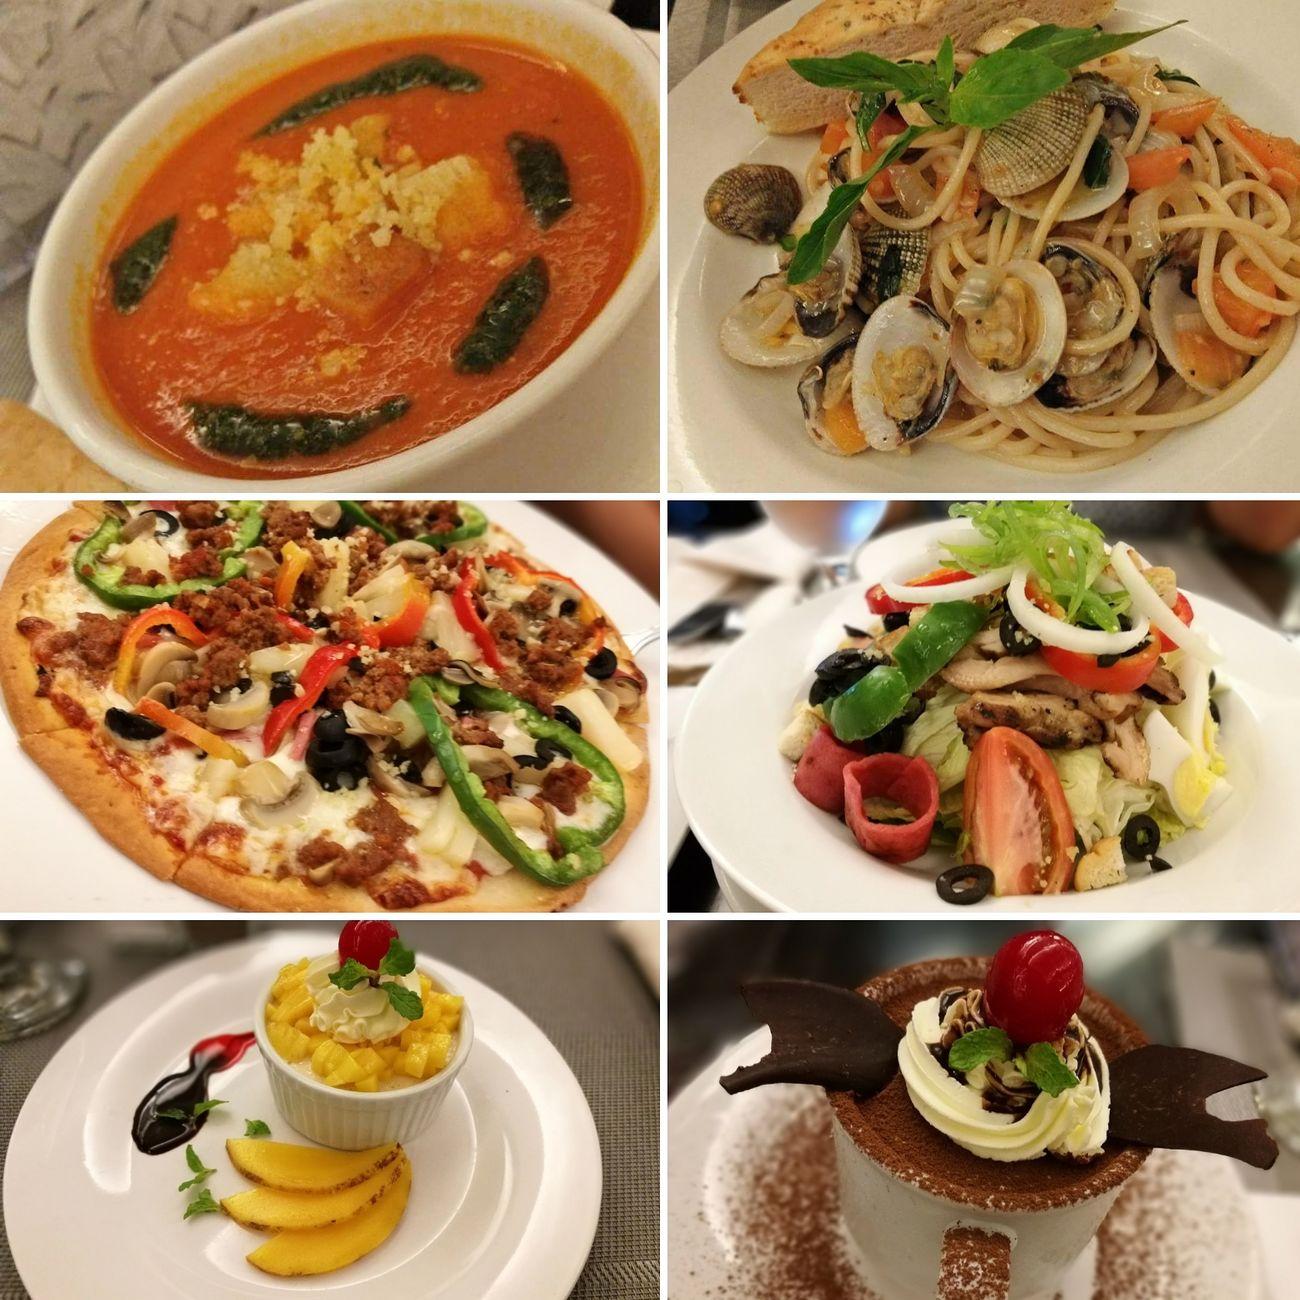 Foods Pizza Pasta Panacota Tiramisu Tomato Capuccino Chef Salad Amore Restaurant Eating Time